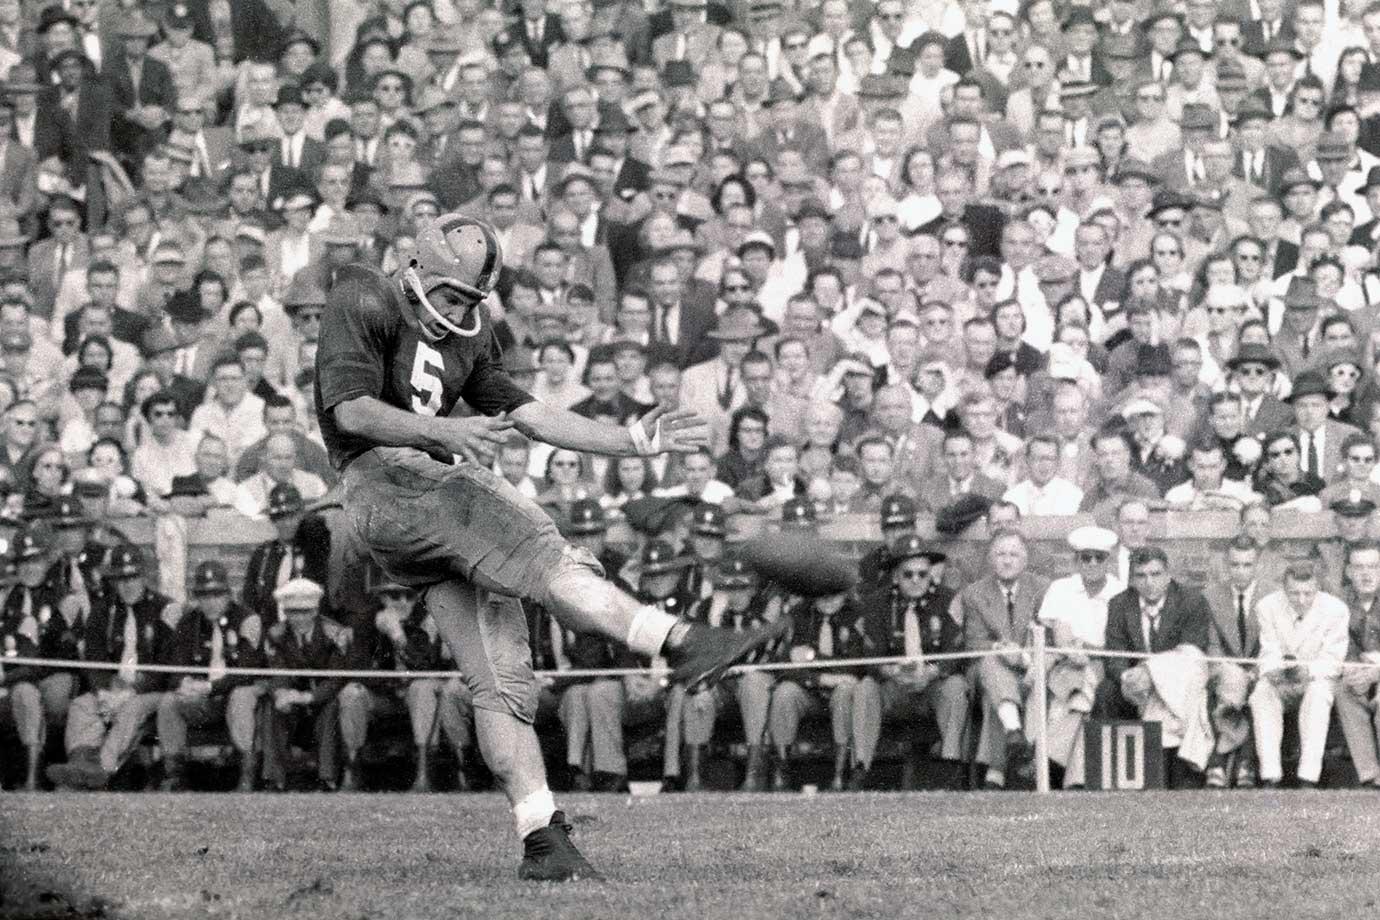 Oct. 20, 1956 — Notre Dame vs. Michigan State